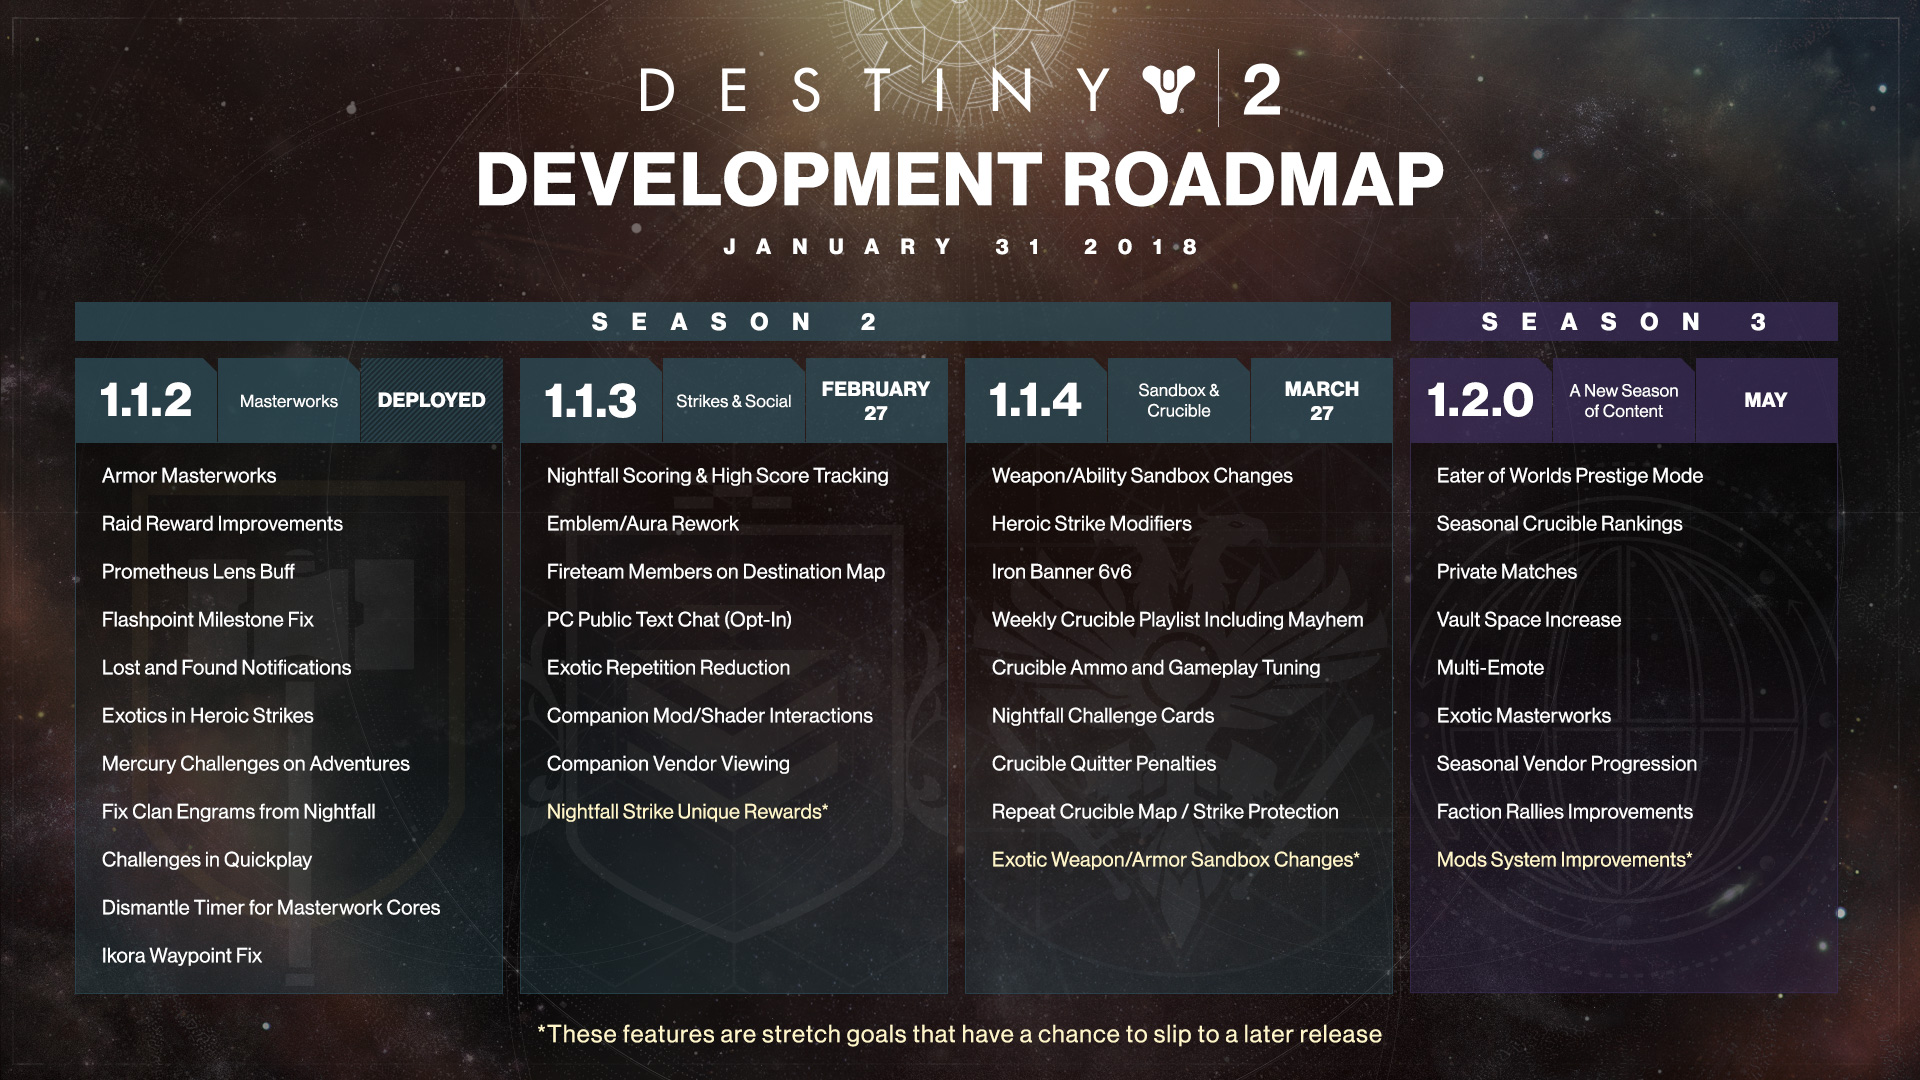 destiny_2_development_roadmap_1920.jpg